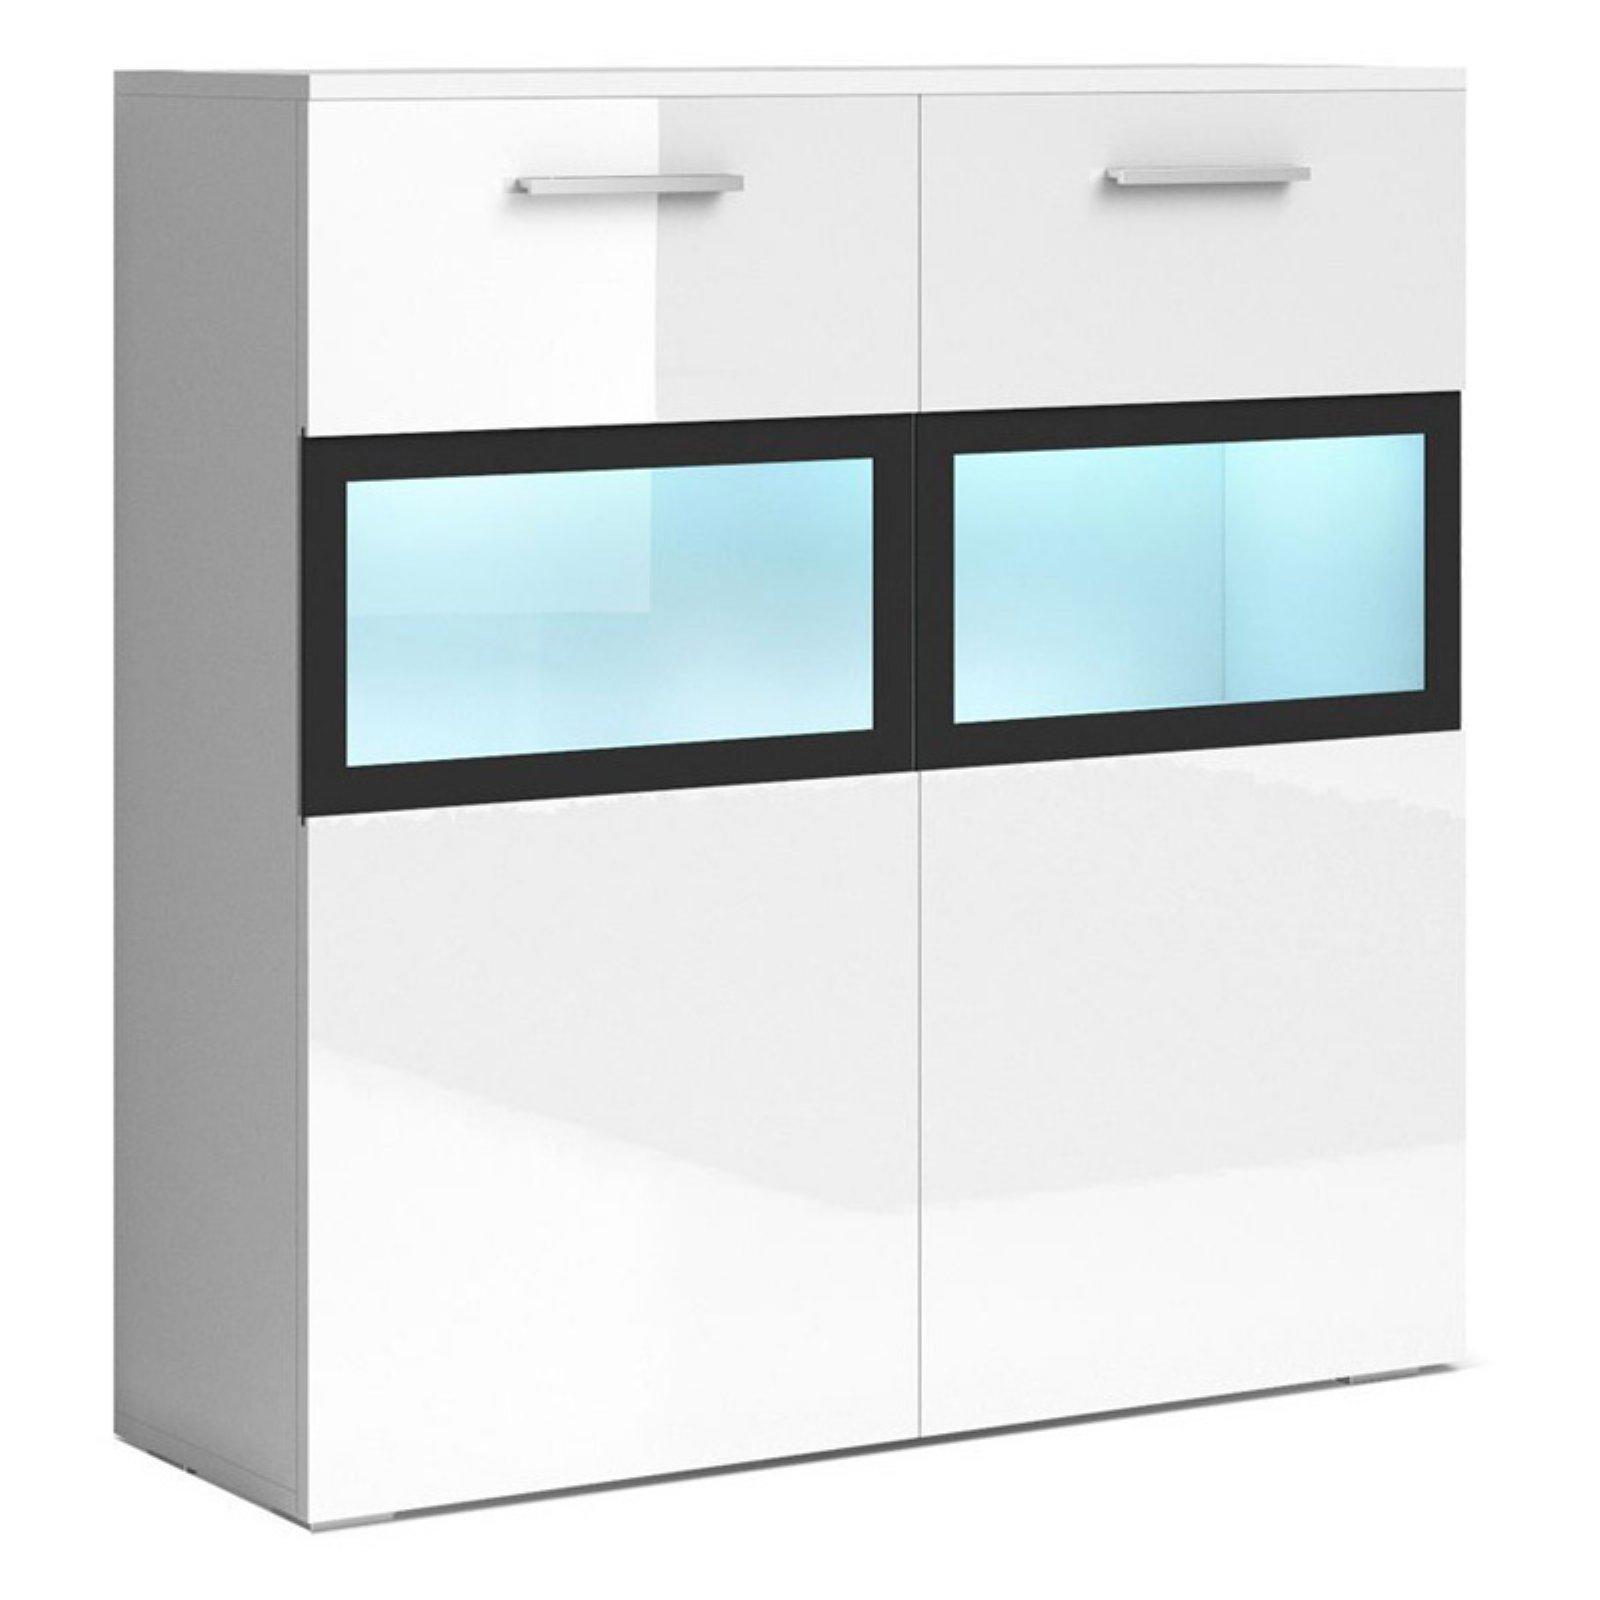 Helvetia Sarah Side Cabinet With Led | Products In 2019 Regarding Kieth 4 Door Credenzas (View 17 of 30)